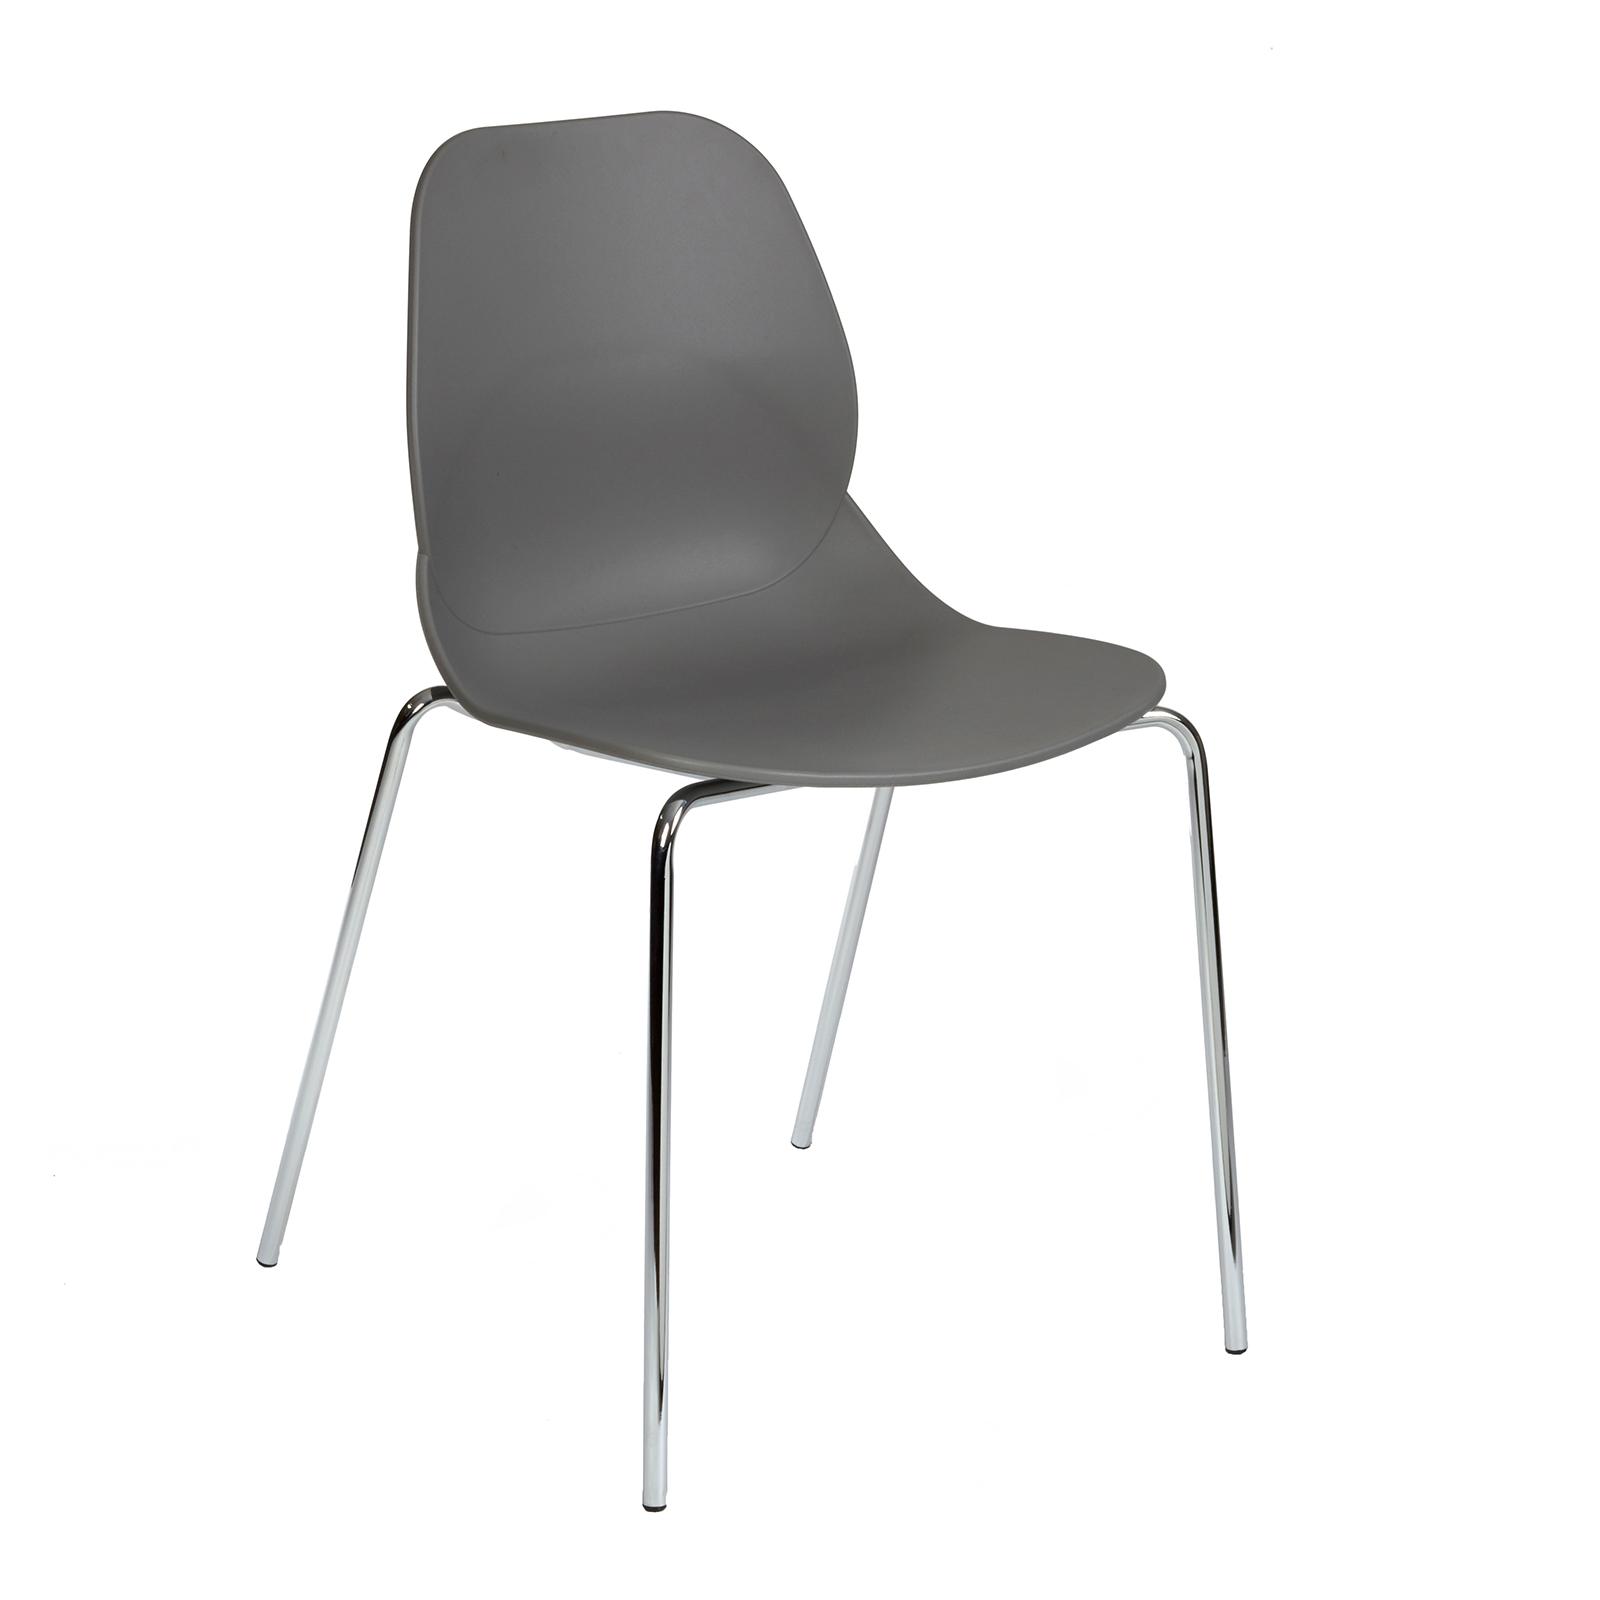 Strut multi-purpose chair with chrome 4 leg frame